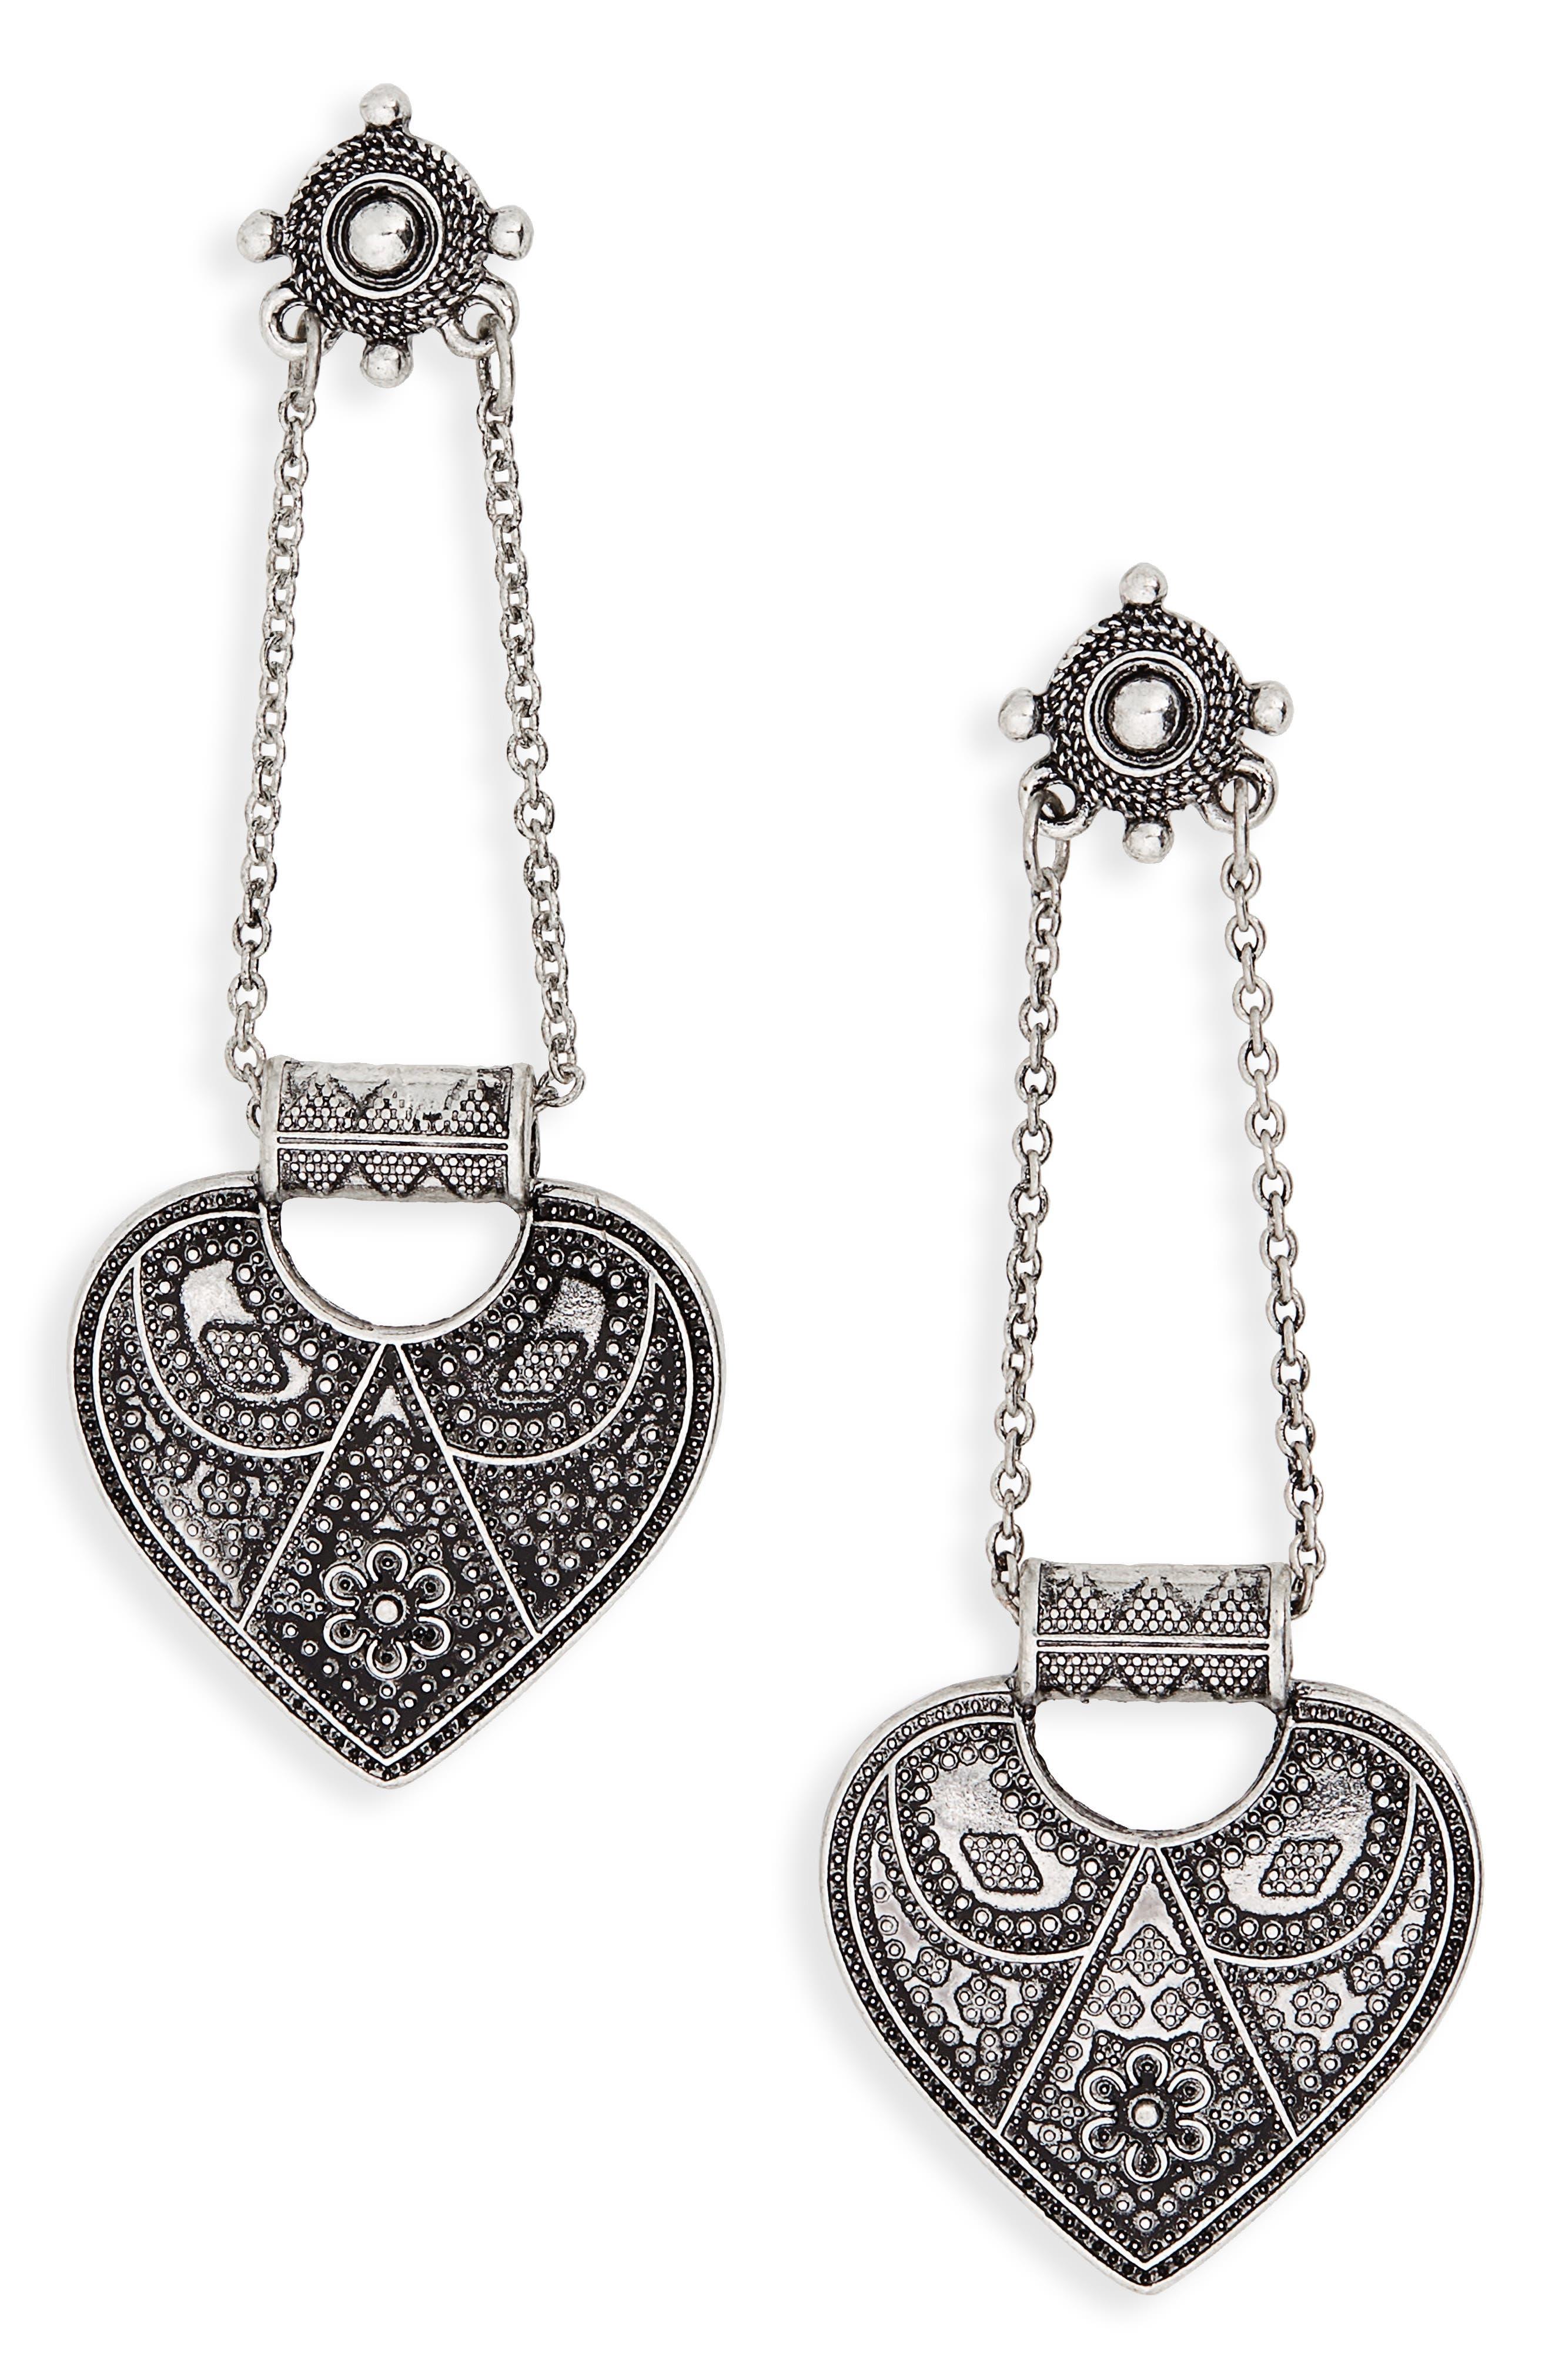 Heart Drop Earrings,                             Main thumbnail 1, color,